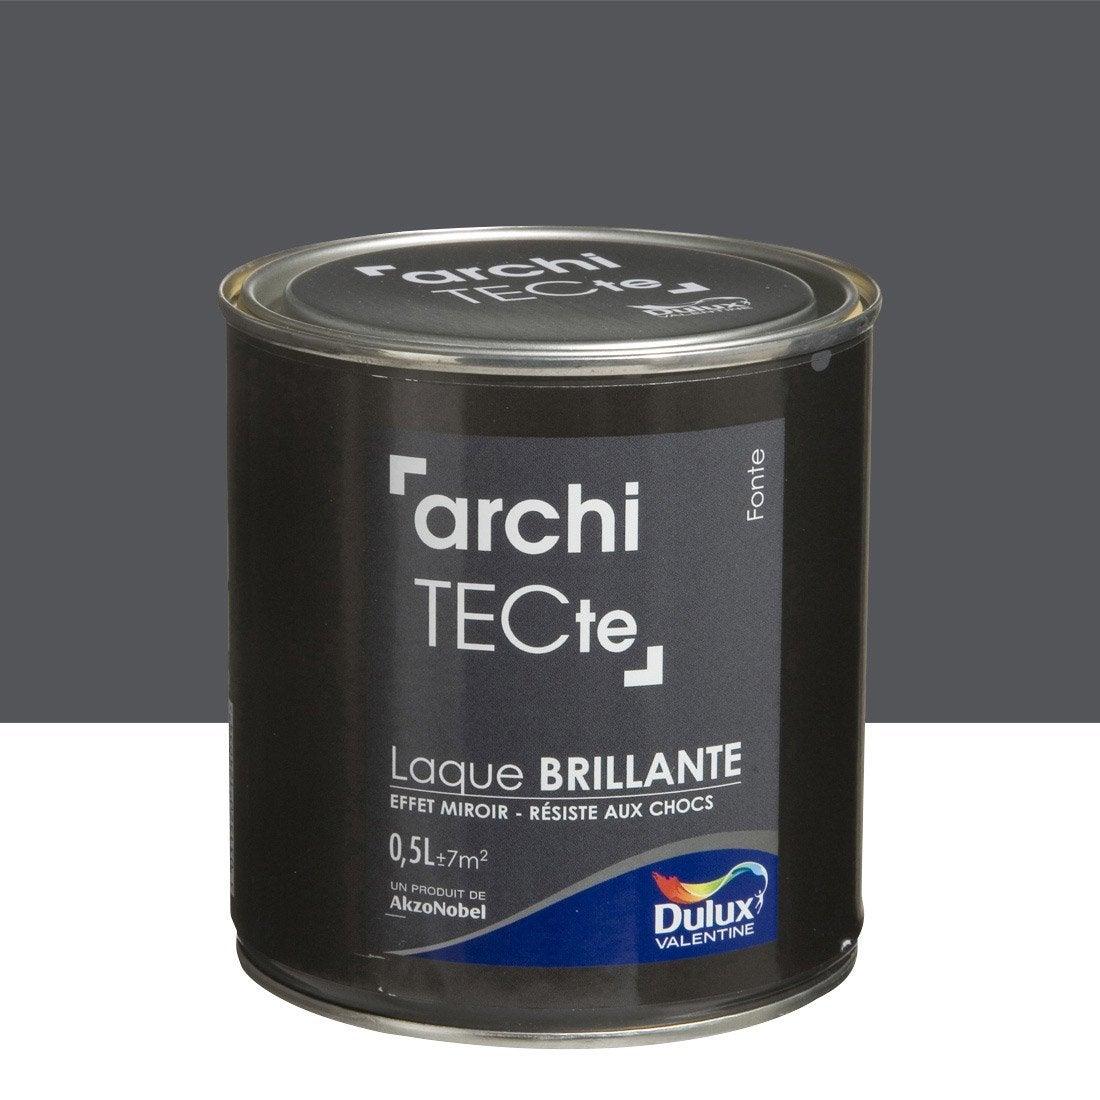 Peinture boiserie architecte dulux valentine gris fonte 0 5 l leroy merlin - Peinture dulux valentine architecte ...